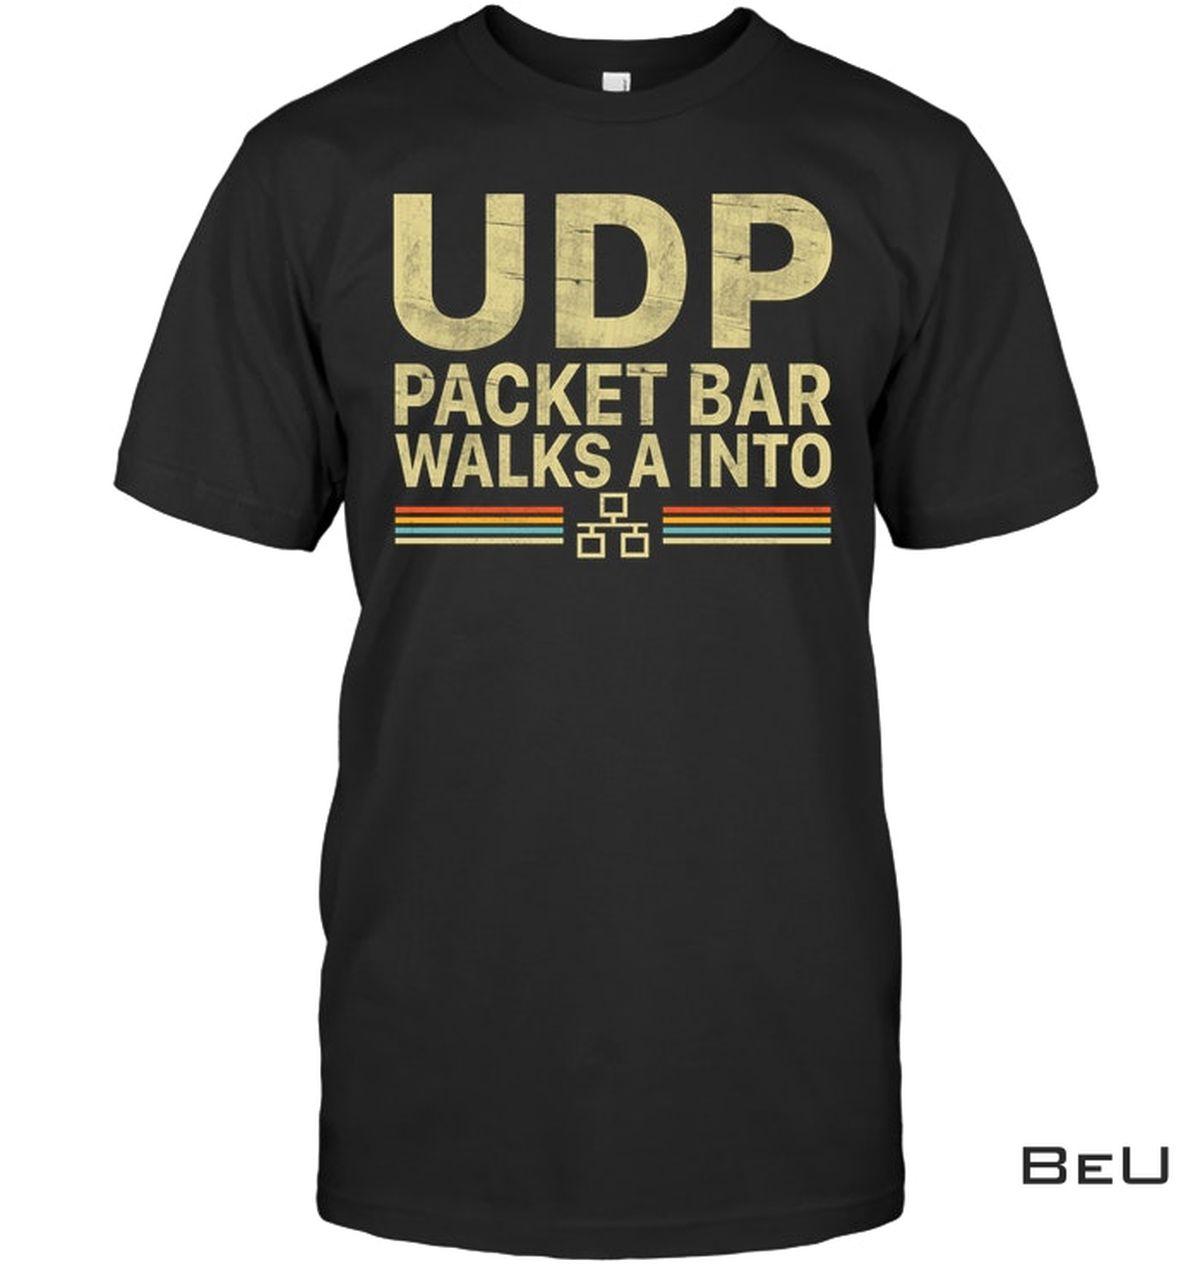 UDP Packet Bar Walk A Into Shirt, hoodie, tank top